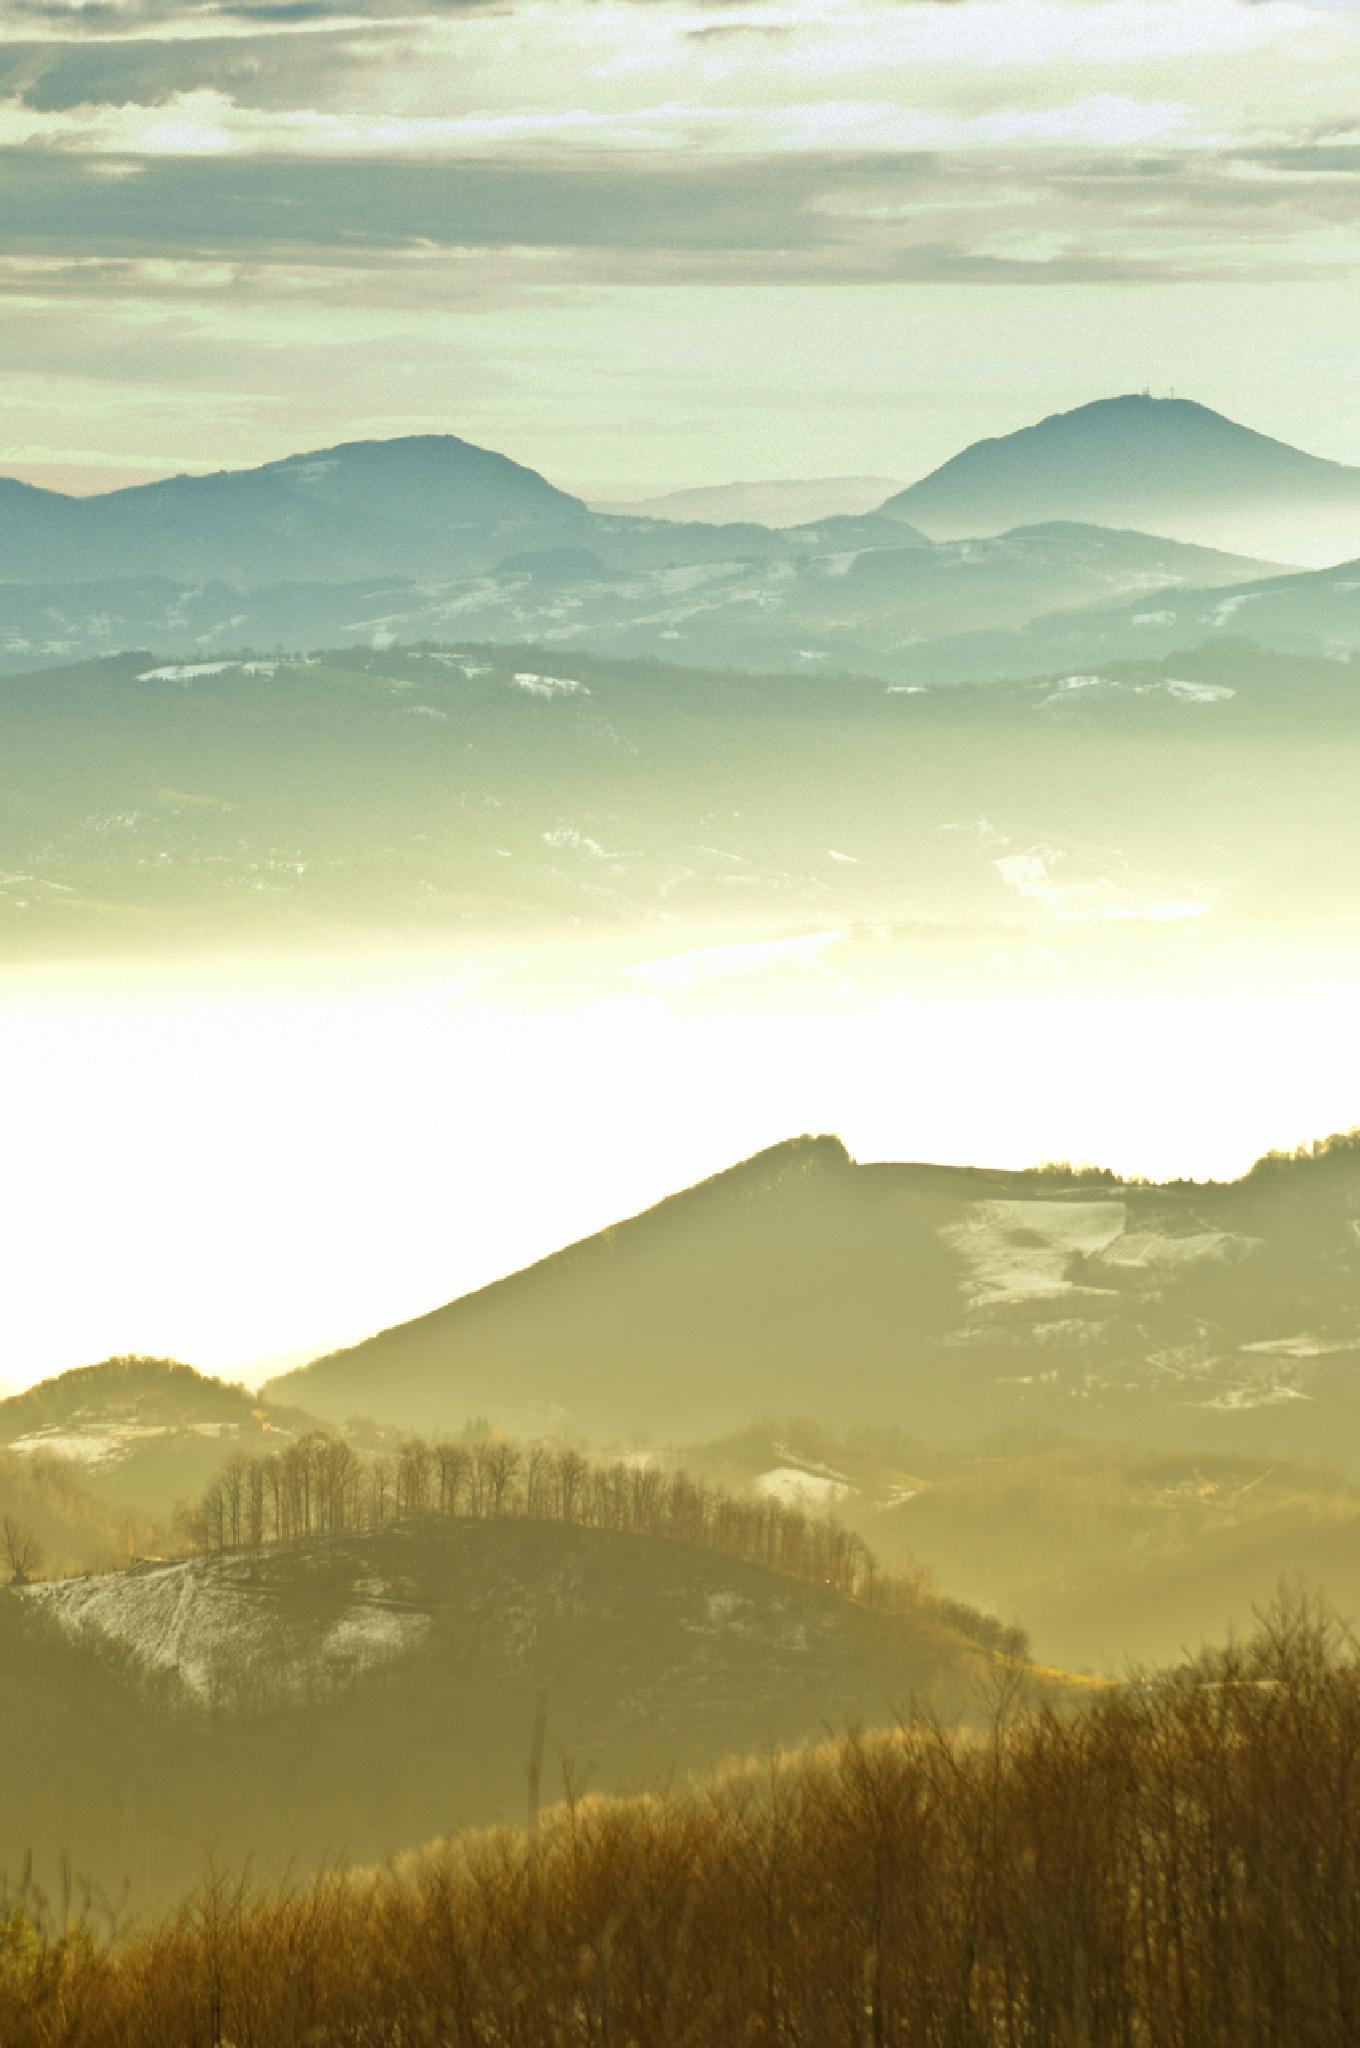 Morning mist by zvonimir.jancic.7